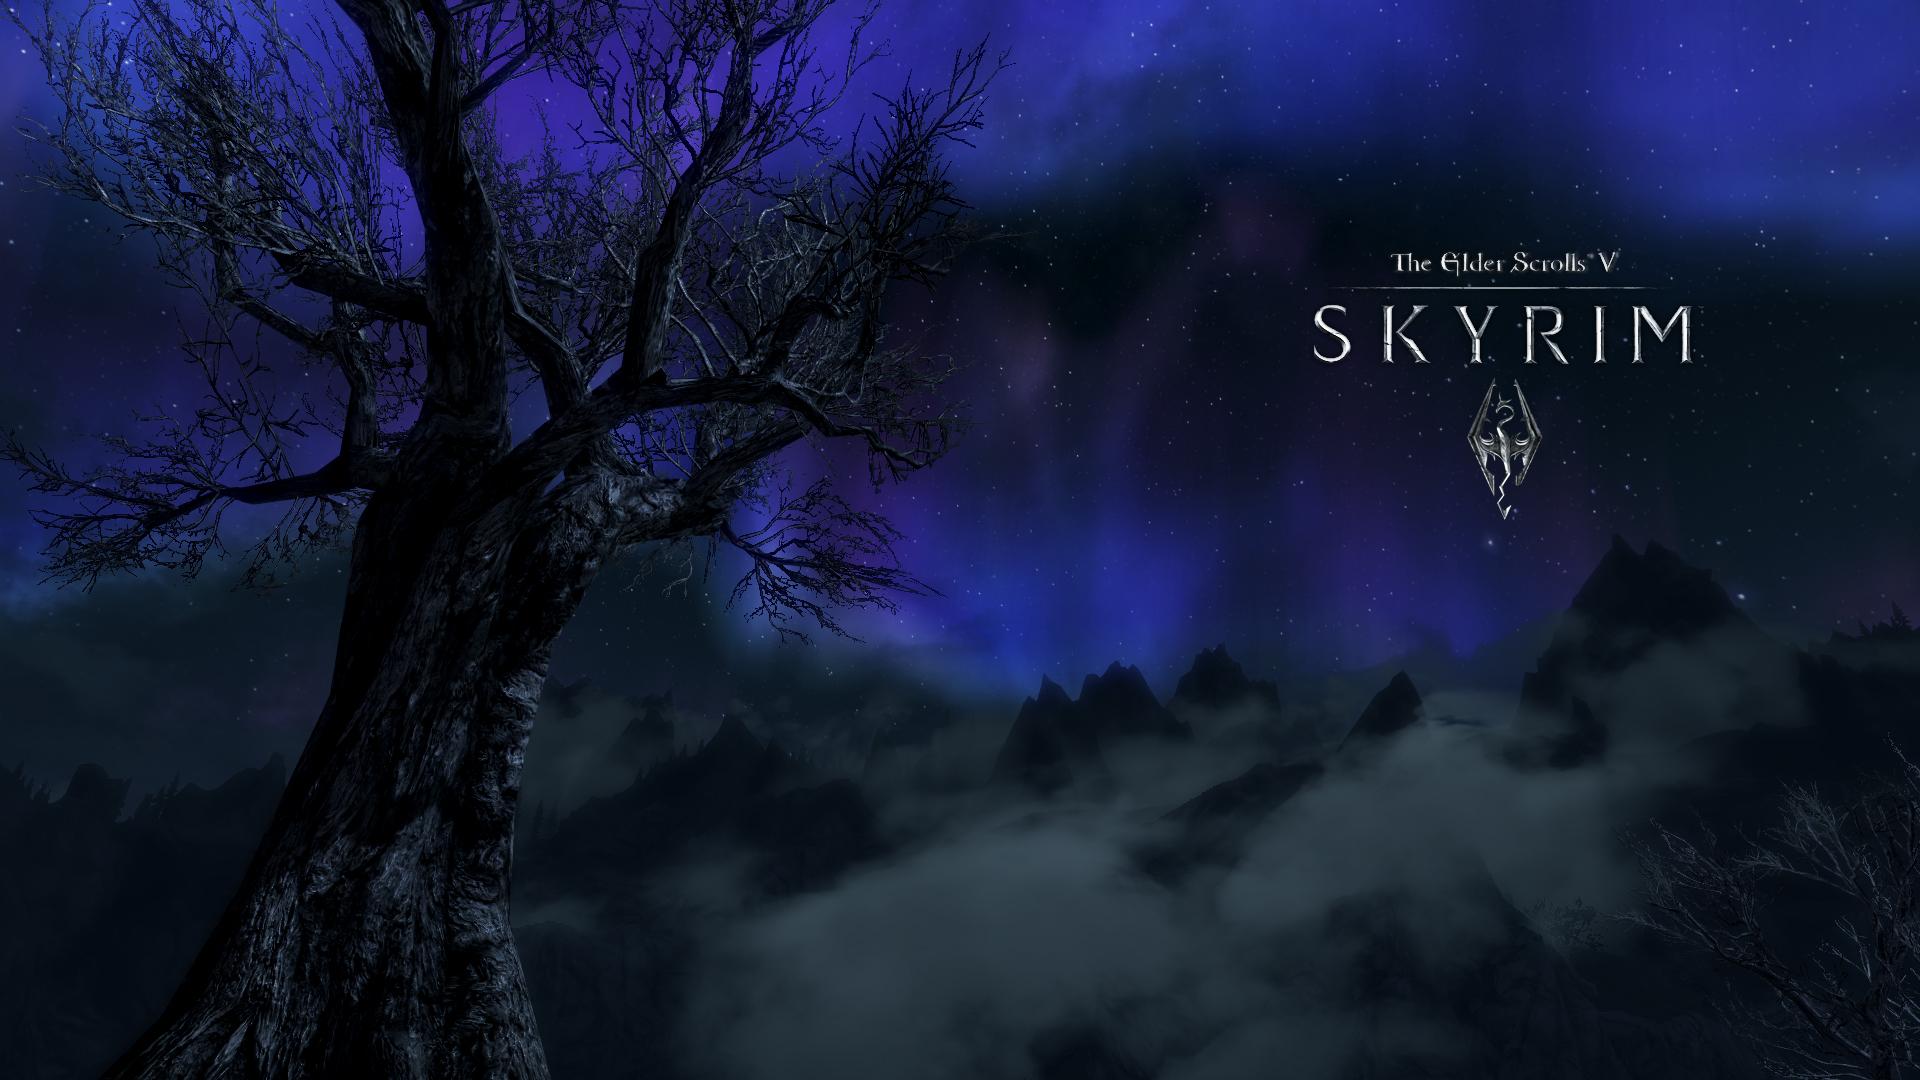 download skyrim full 1920x1080 - photo #19